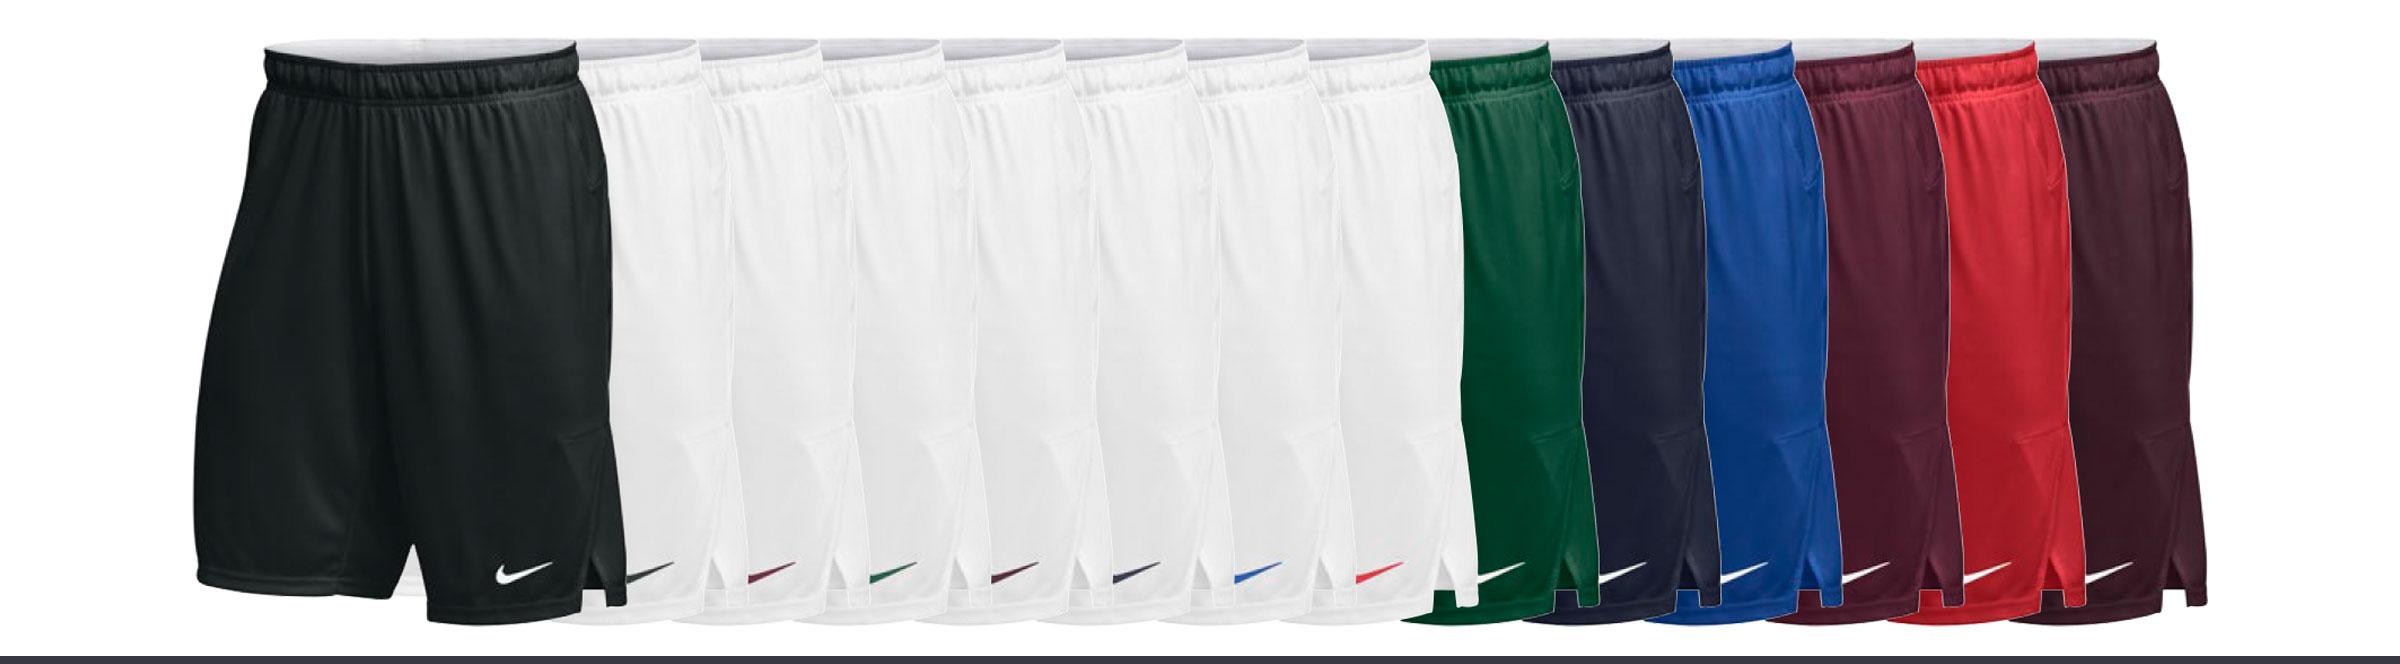 Custom Nike Lacrosse Shorts - Untouchable Speed Core